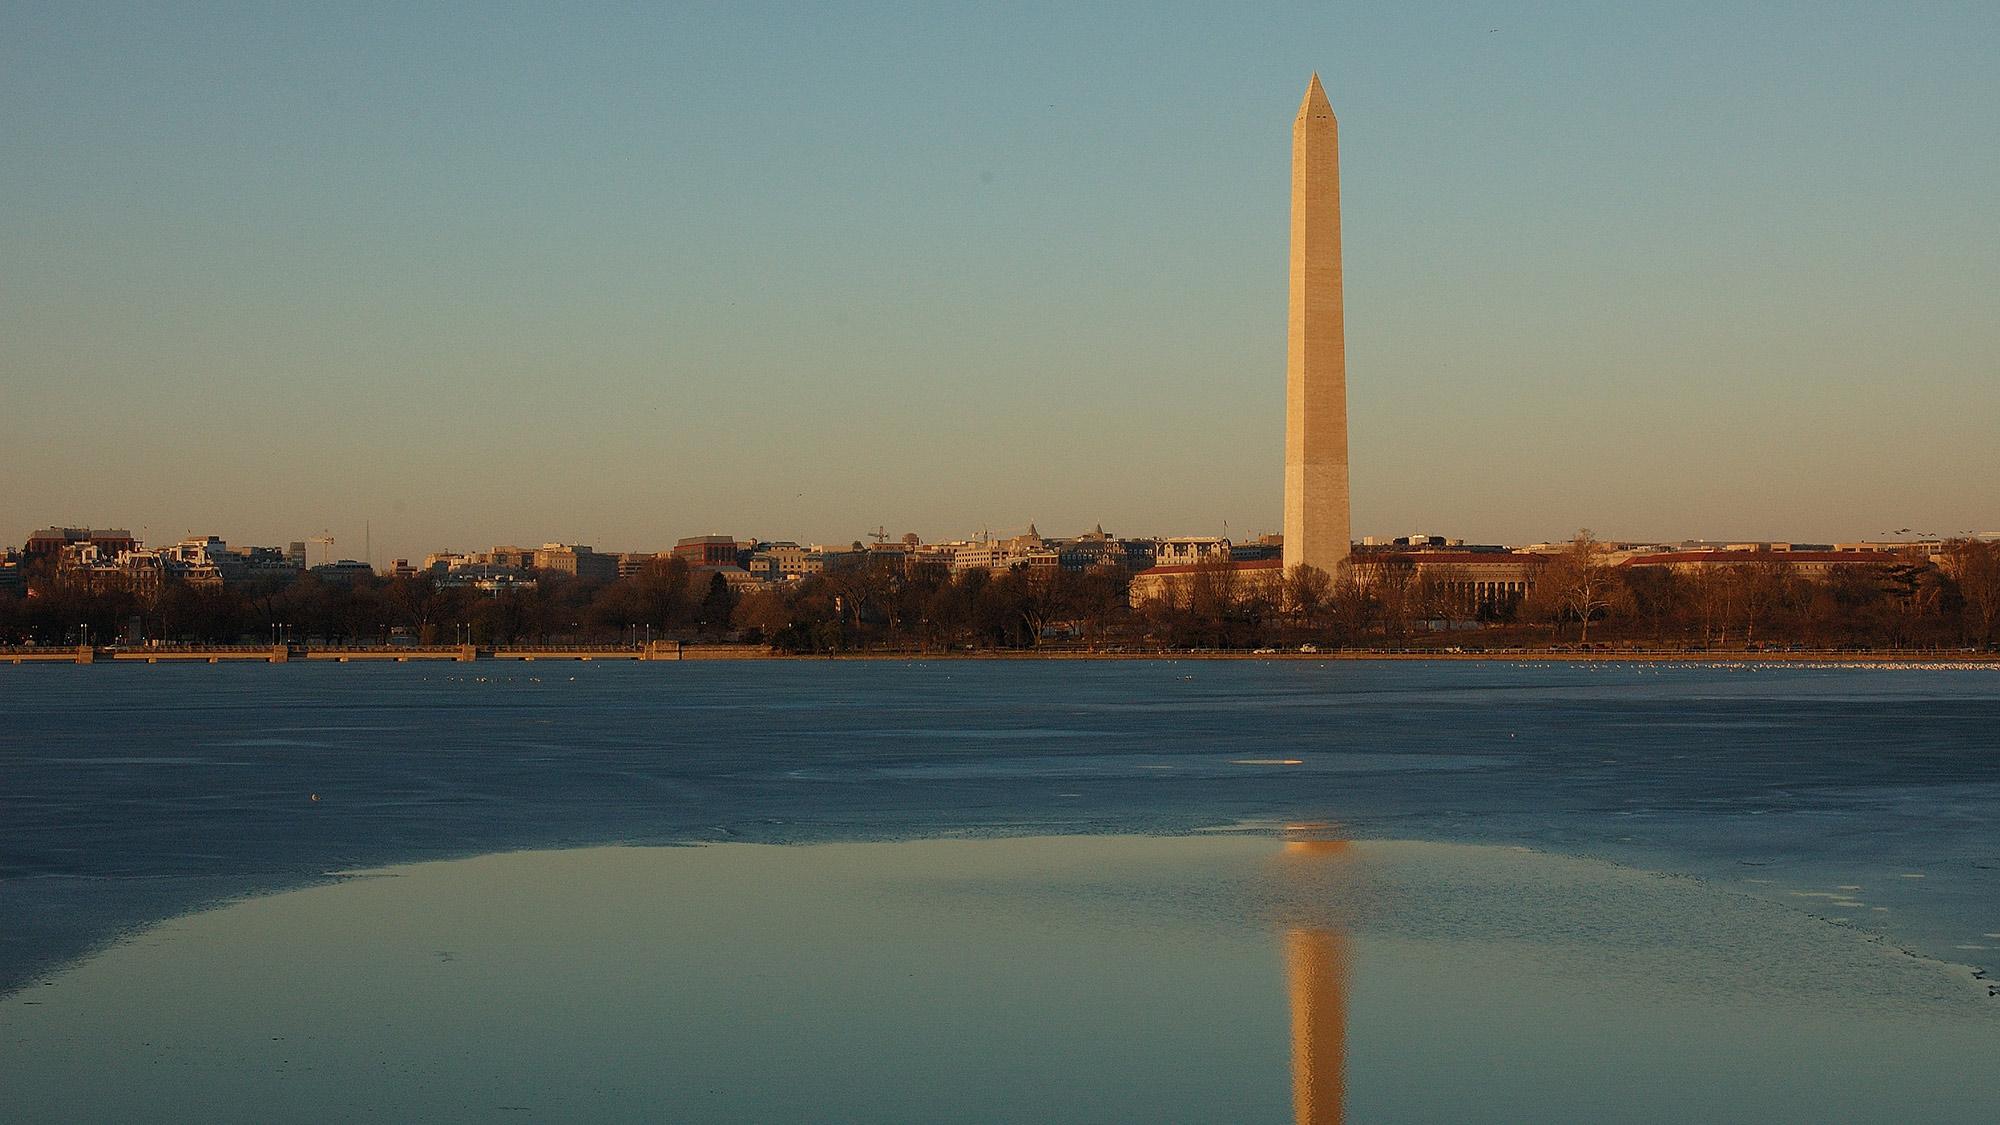 Washington Monument and Potomac River